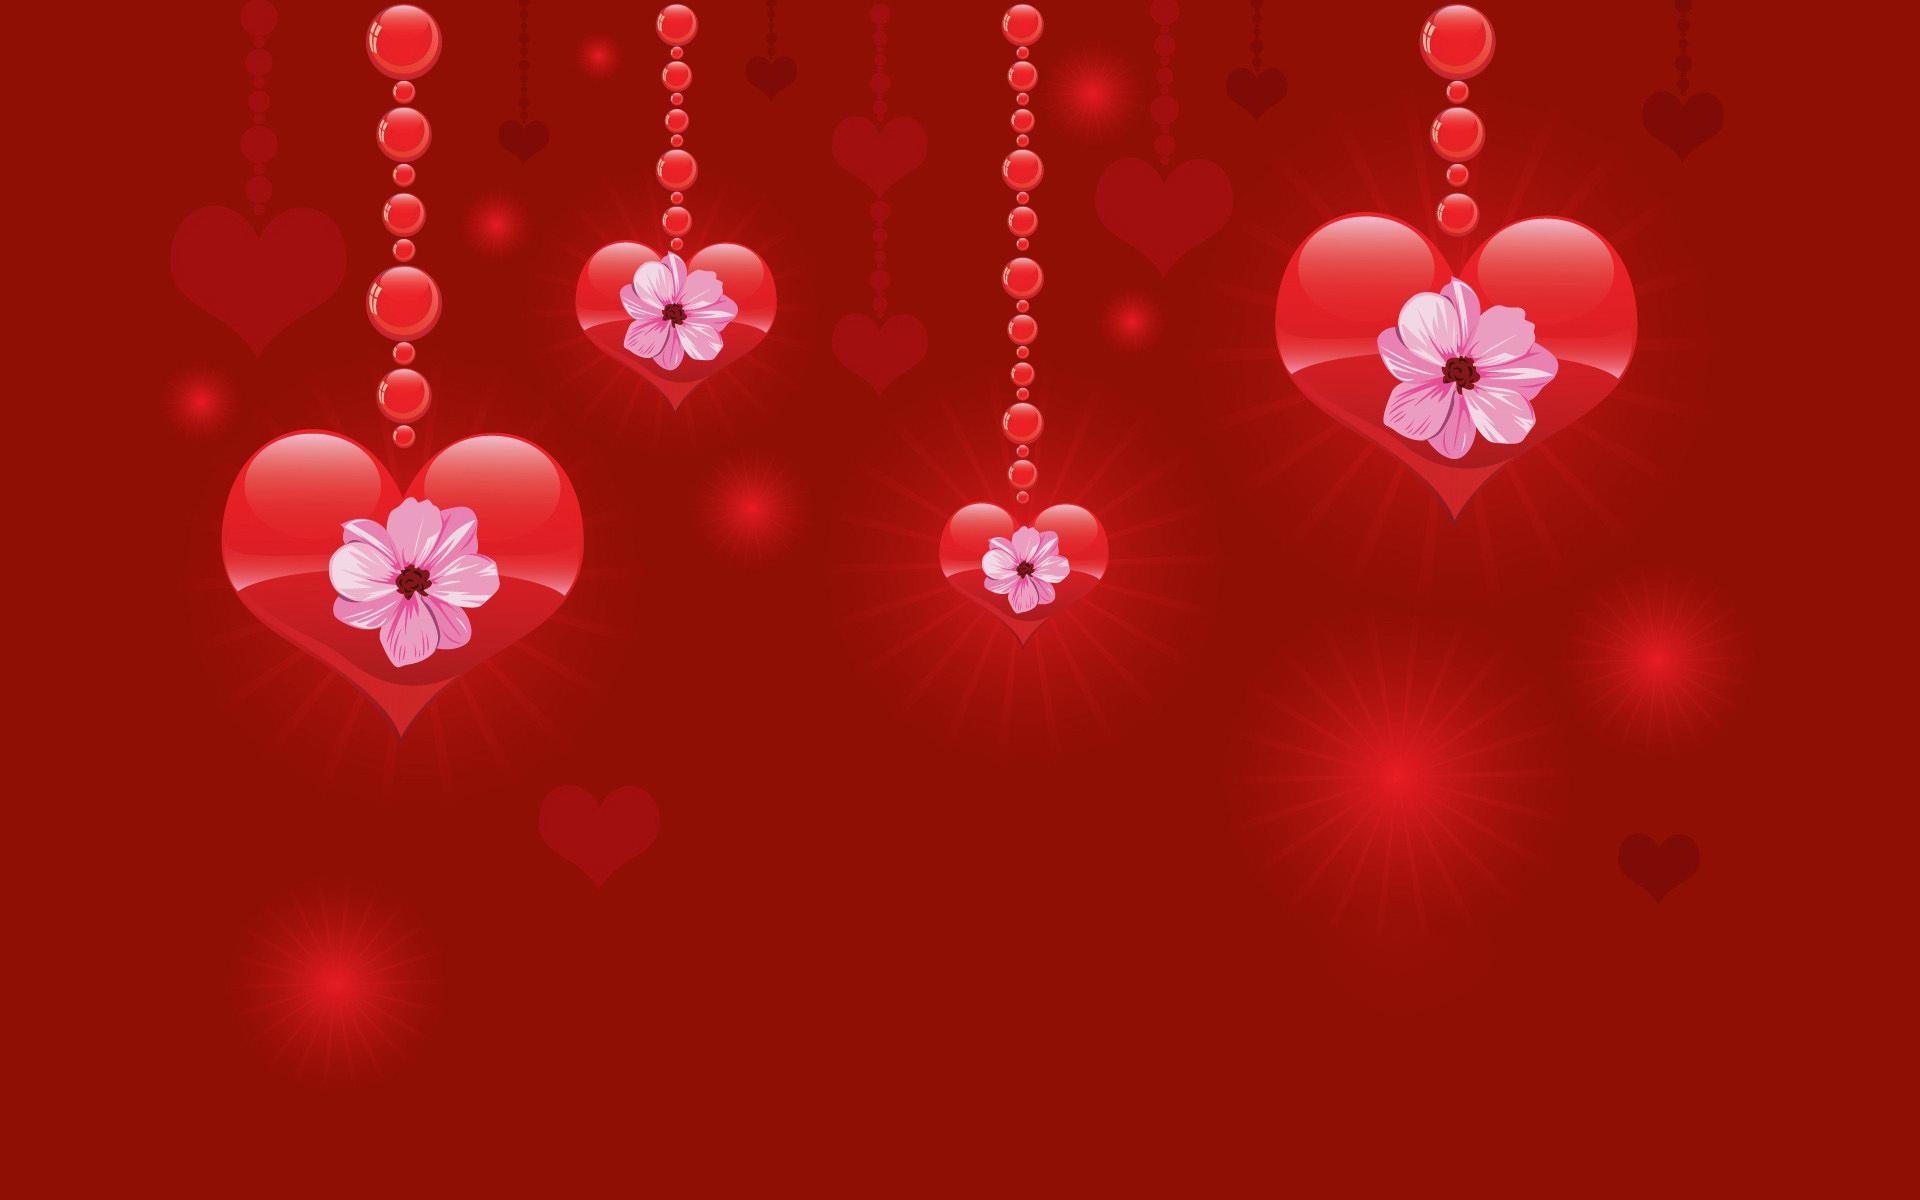 day desktop wallpapers valentines - photo #44